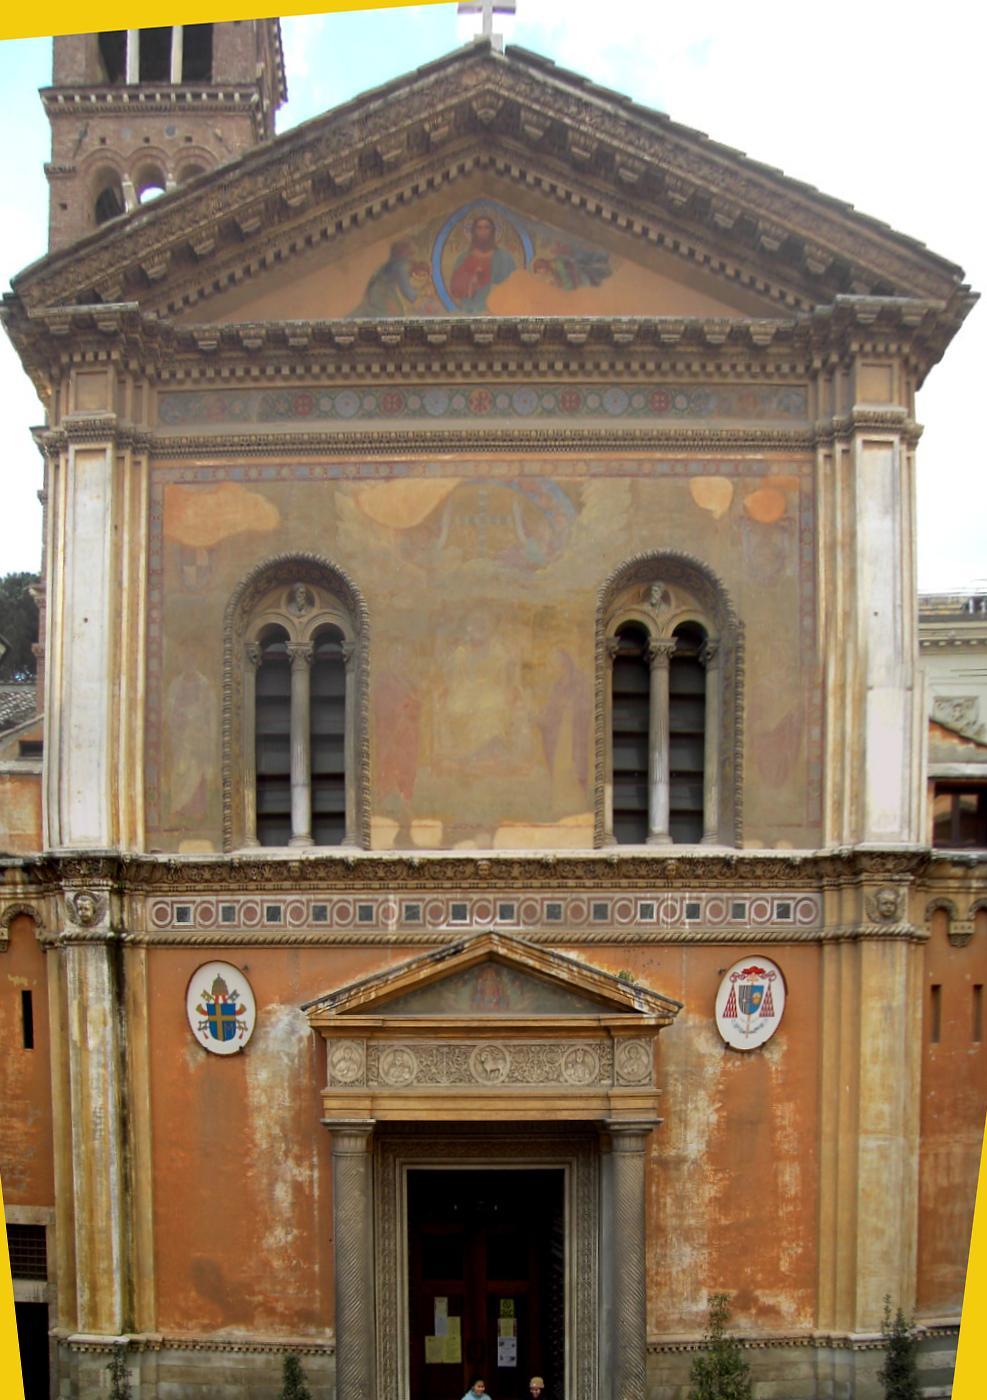 Basilica di Santa Pudenziana - Wikipedia